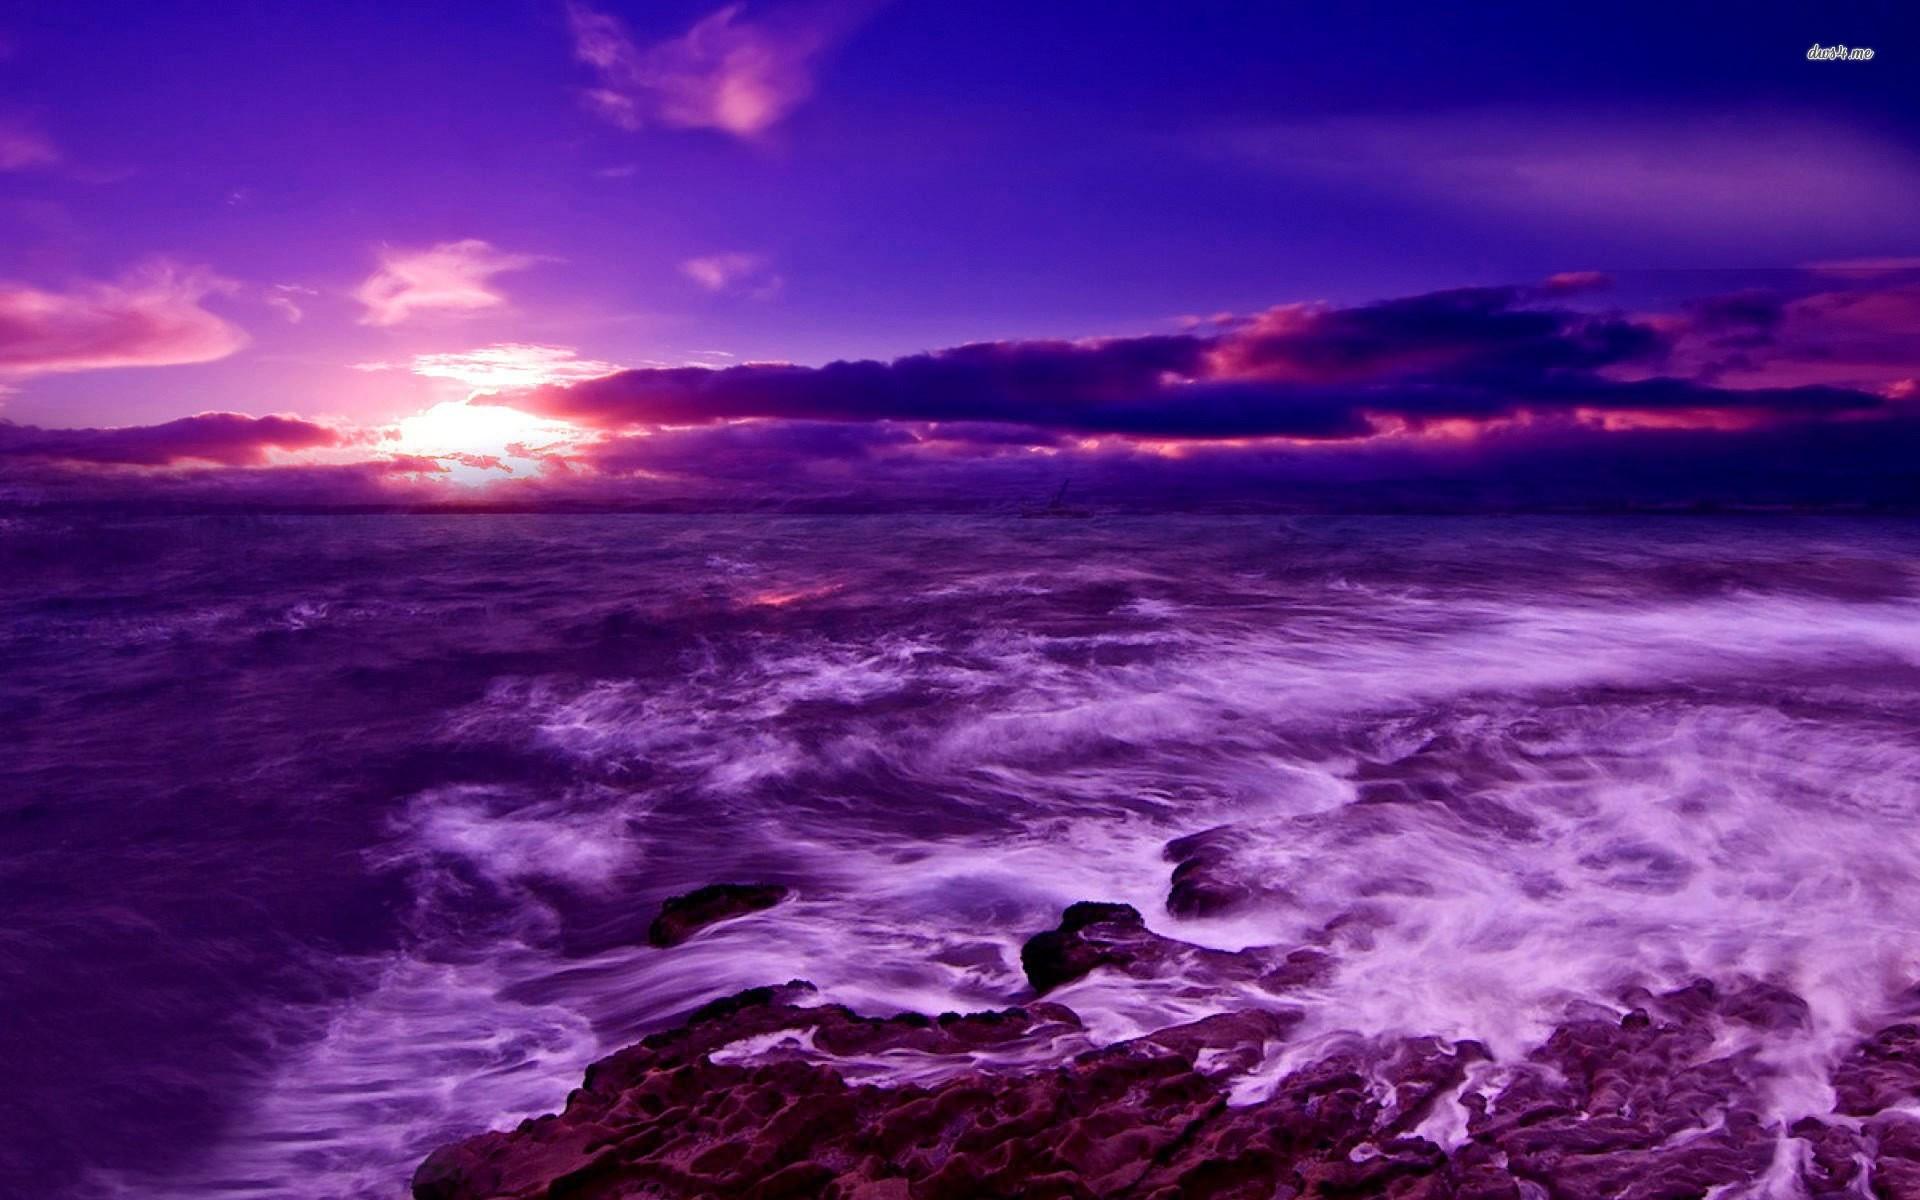 Shipwreck Purple Sunset Wallpaper Wallpapertic - Oil Paintings Art Landscape Nature , HD Wallpaper & Backgrounds